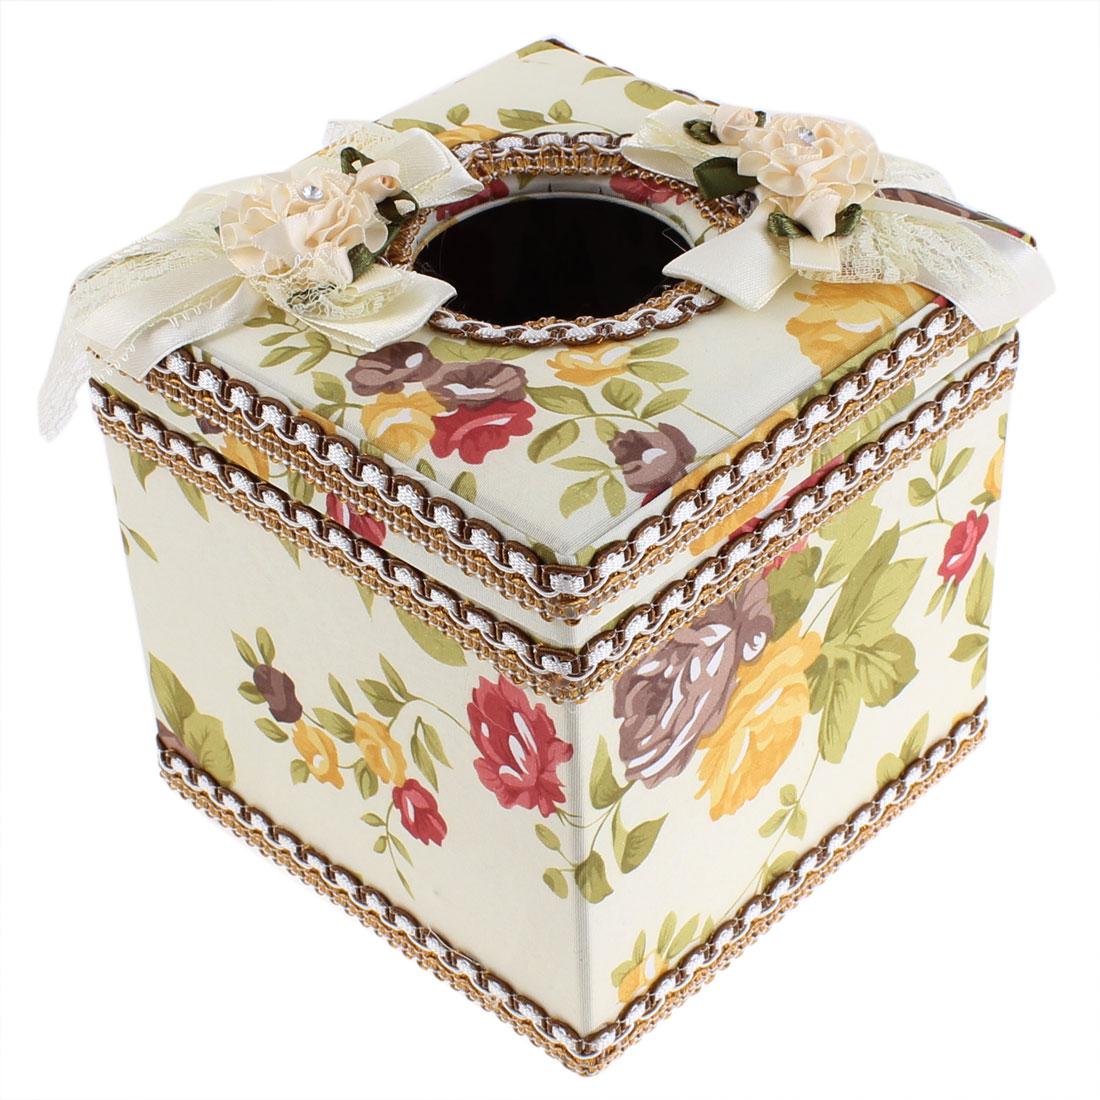 Flowers Pattern Square Shaped Napkin Tissue Storage Box Holder